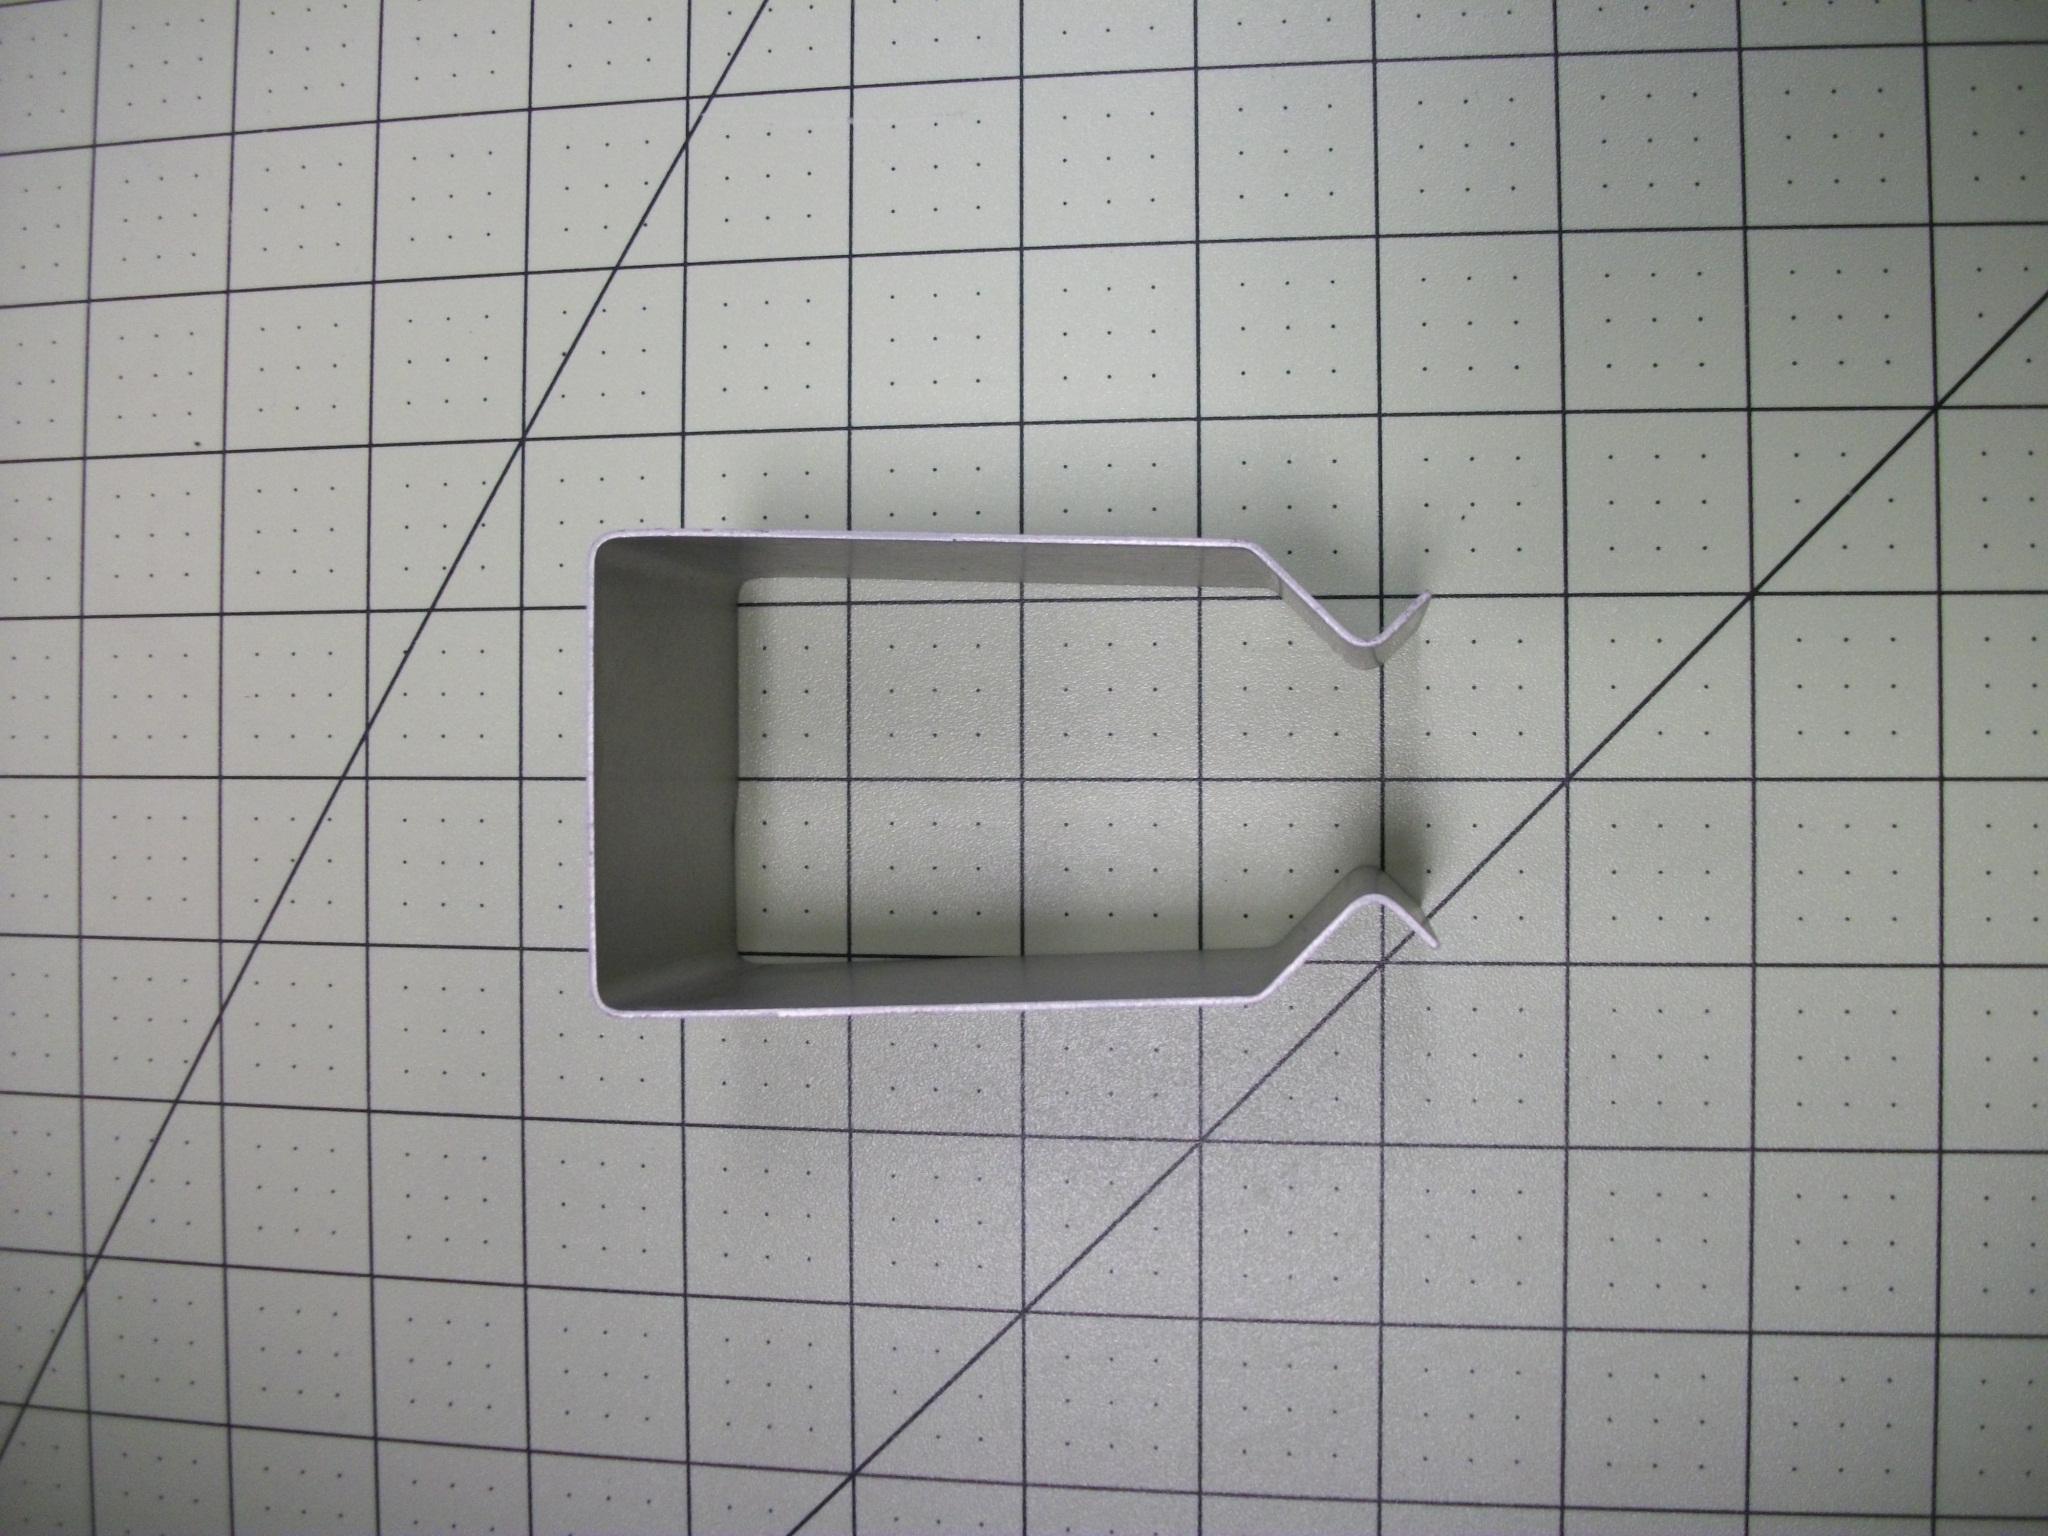 Cover lift A/B